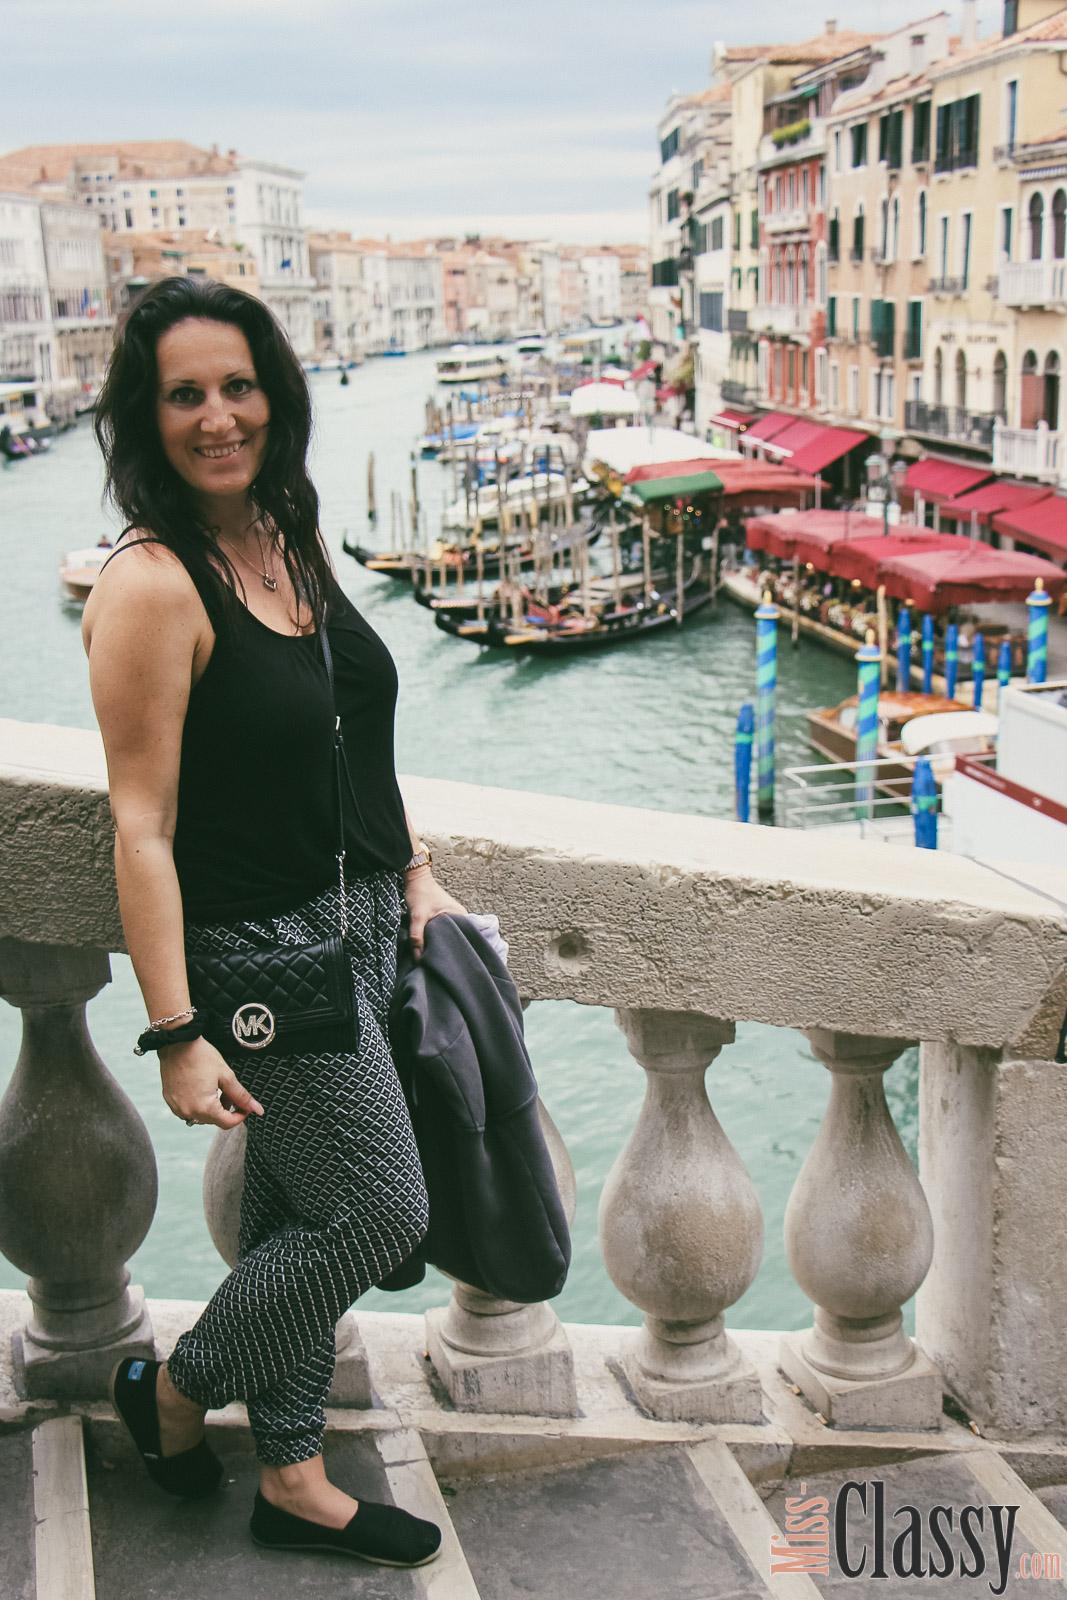 TRAVEL Venedig - die ewige Stadt der Liebe, Miss Classy, missclassy, classy, beclassy, Travelblog, Travelblogger, Wayfarer, Wanderlust, Abenteuer, Reise, Venedig, Venice, Venezia, Italien, Lagune, Lagunenstadt, Gondel, Canal Grande, Markusplatz, Rialtobrücke